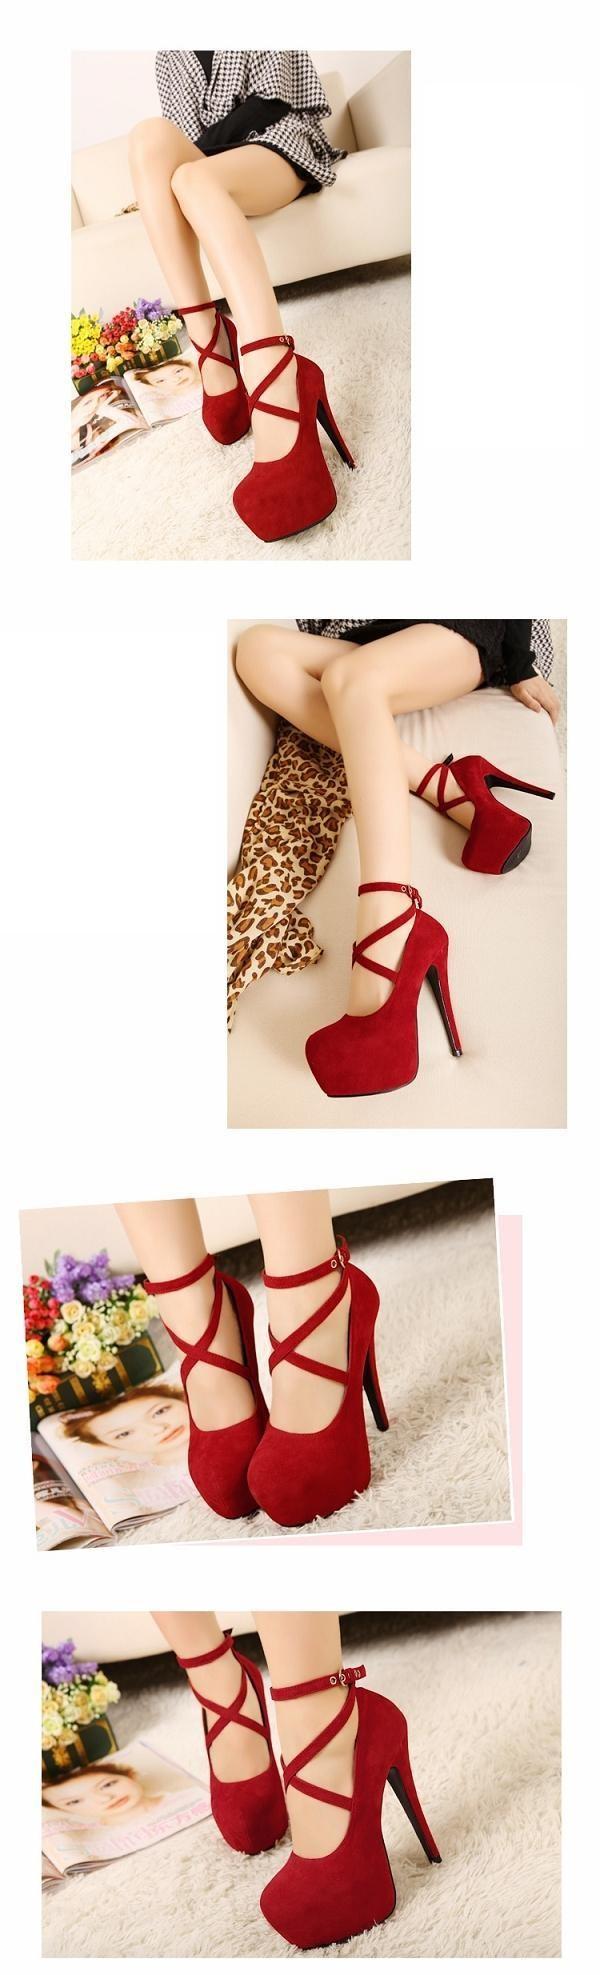 shoes res shoes high heels croos-strap platform stilettos stilettos